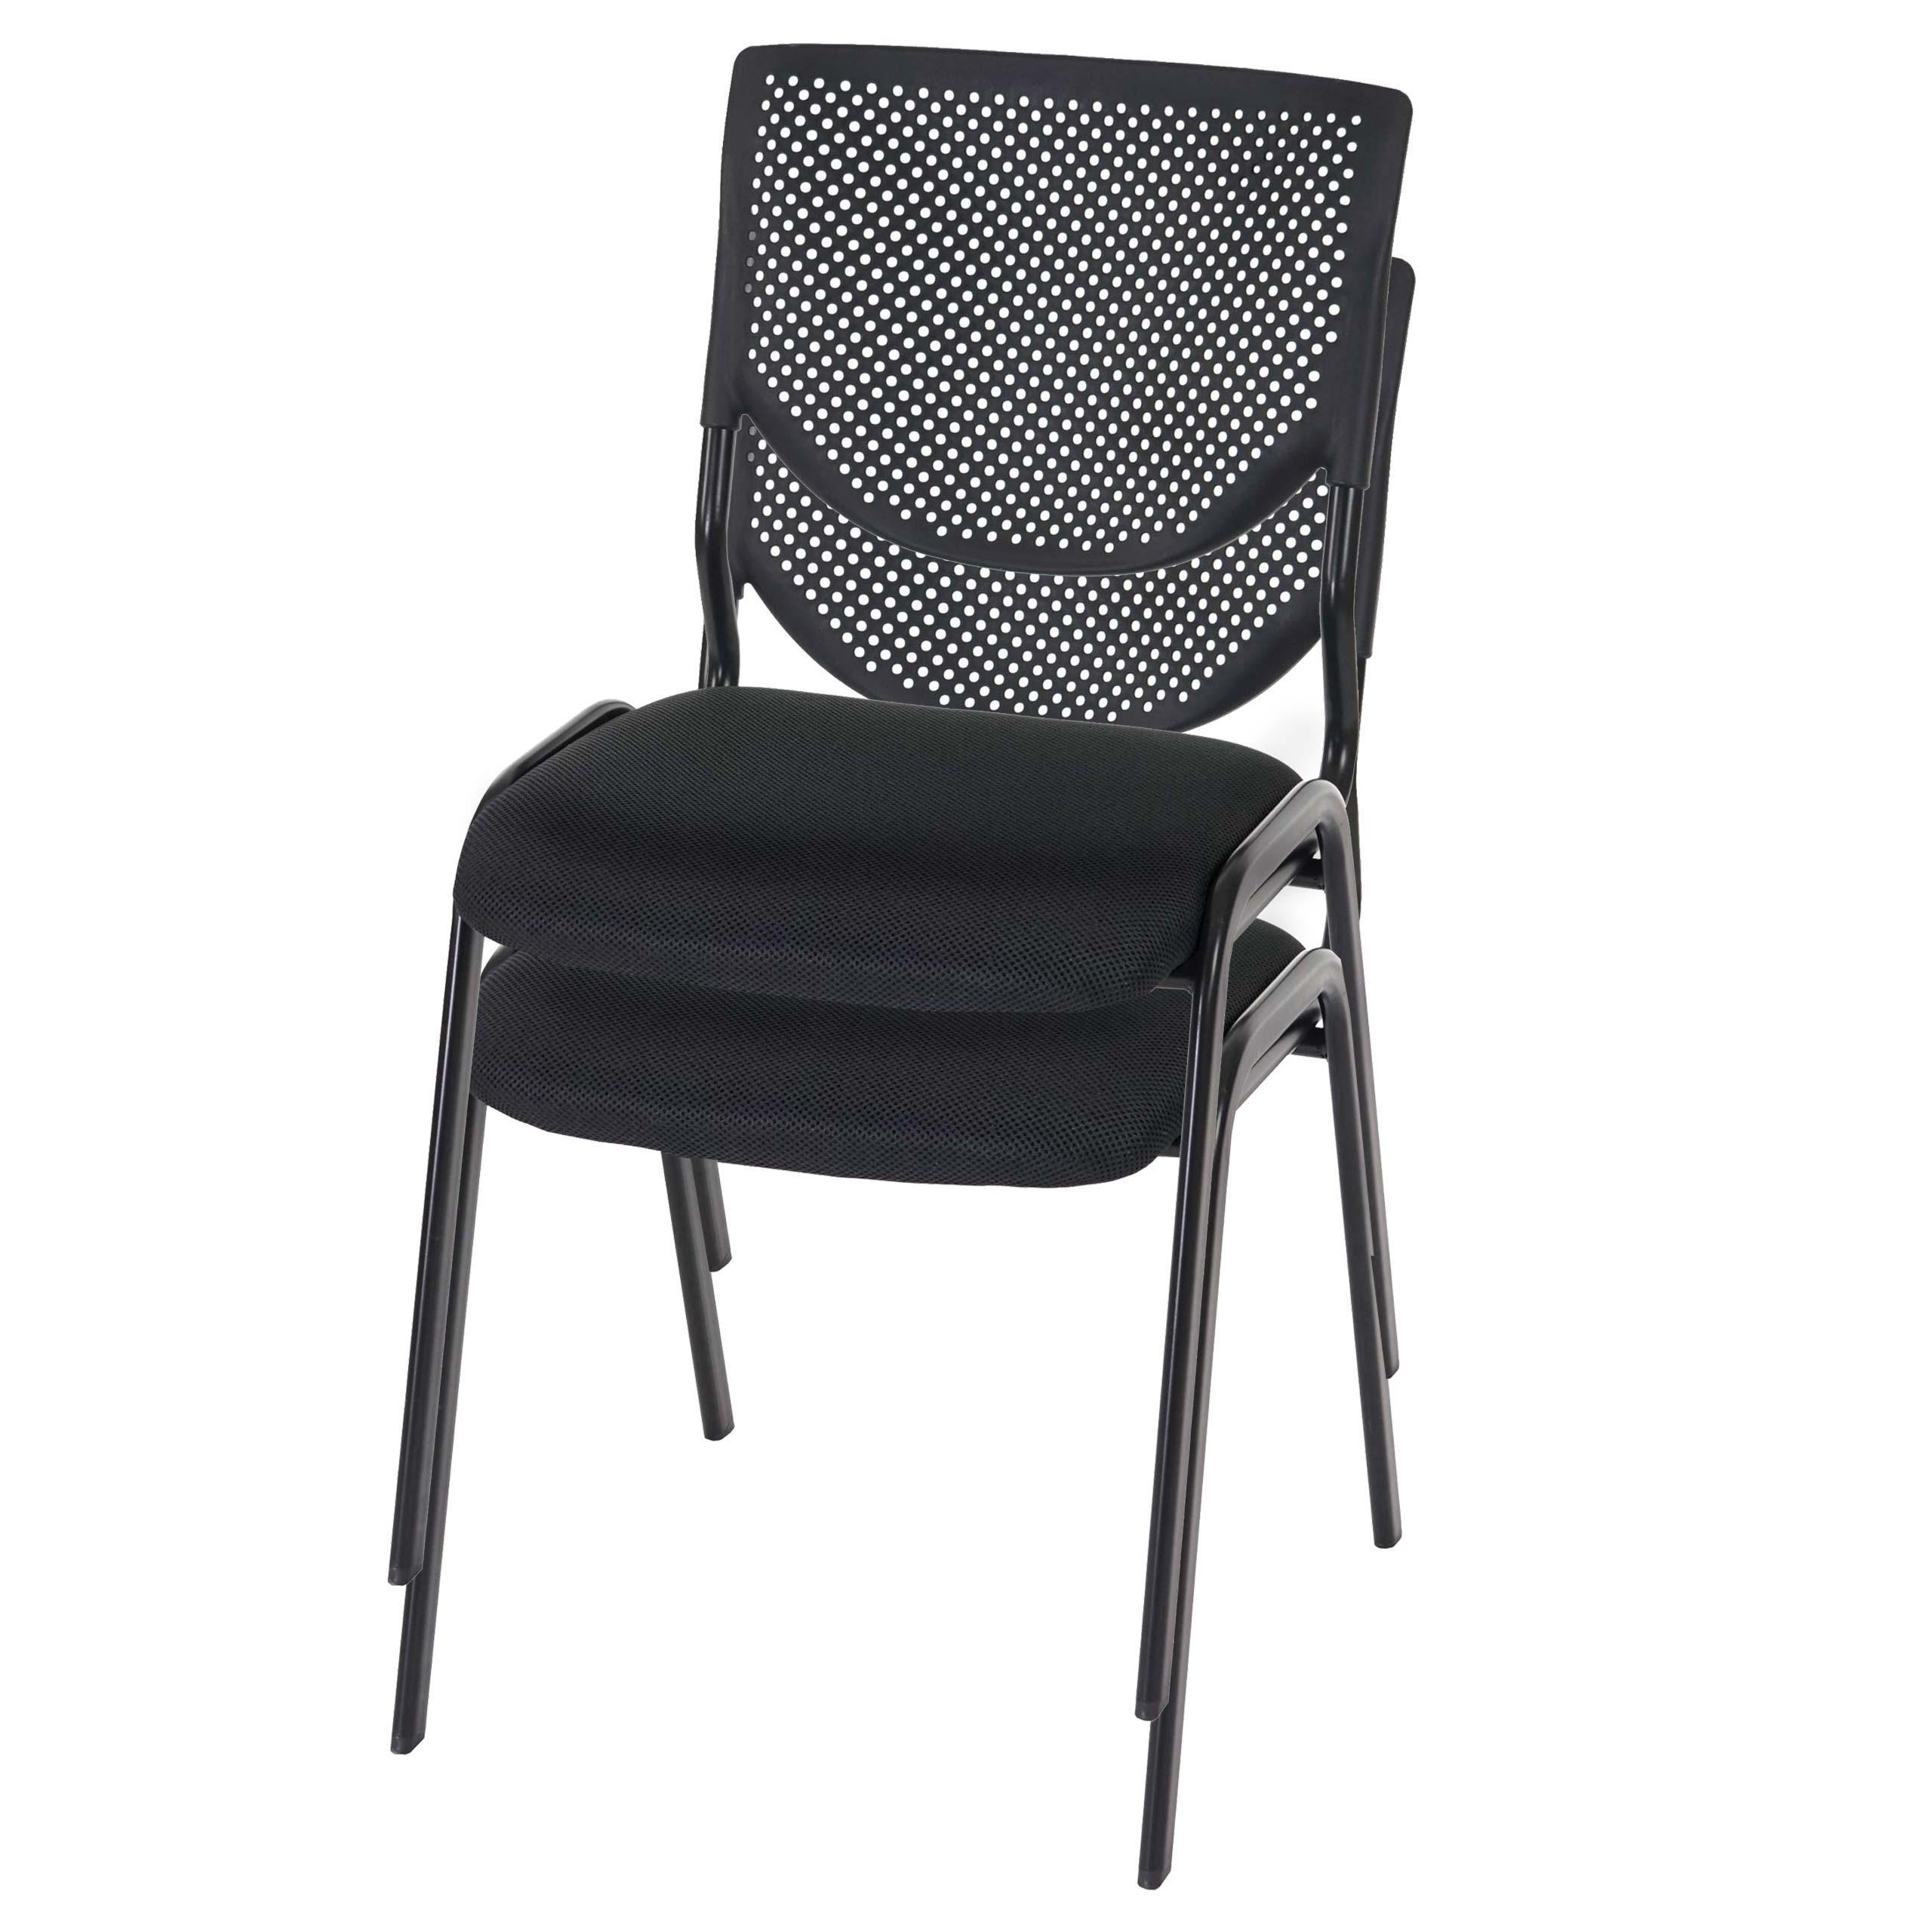 Sillas comodas mesas de comedor forma interesante sillas for Sillas comodas comedor